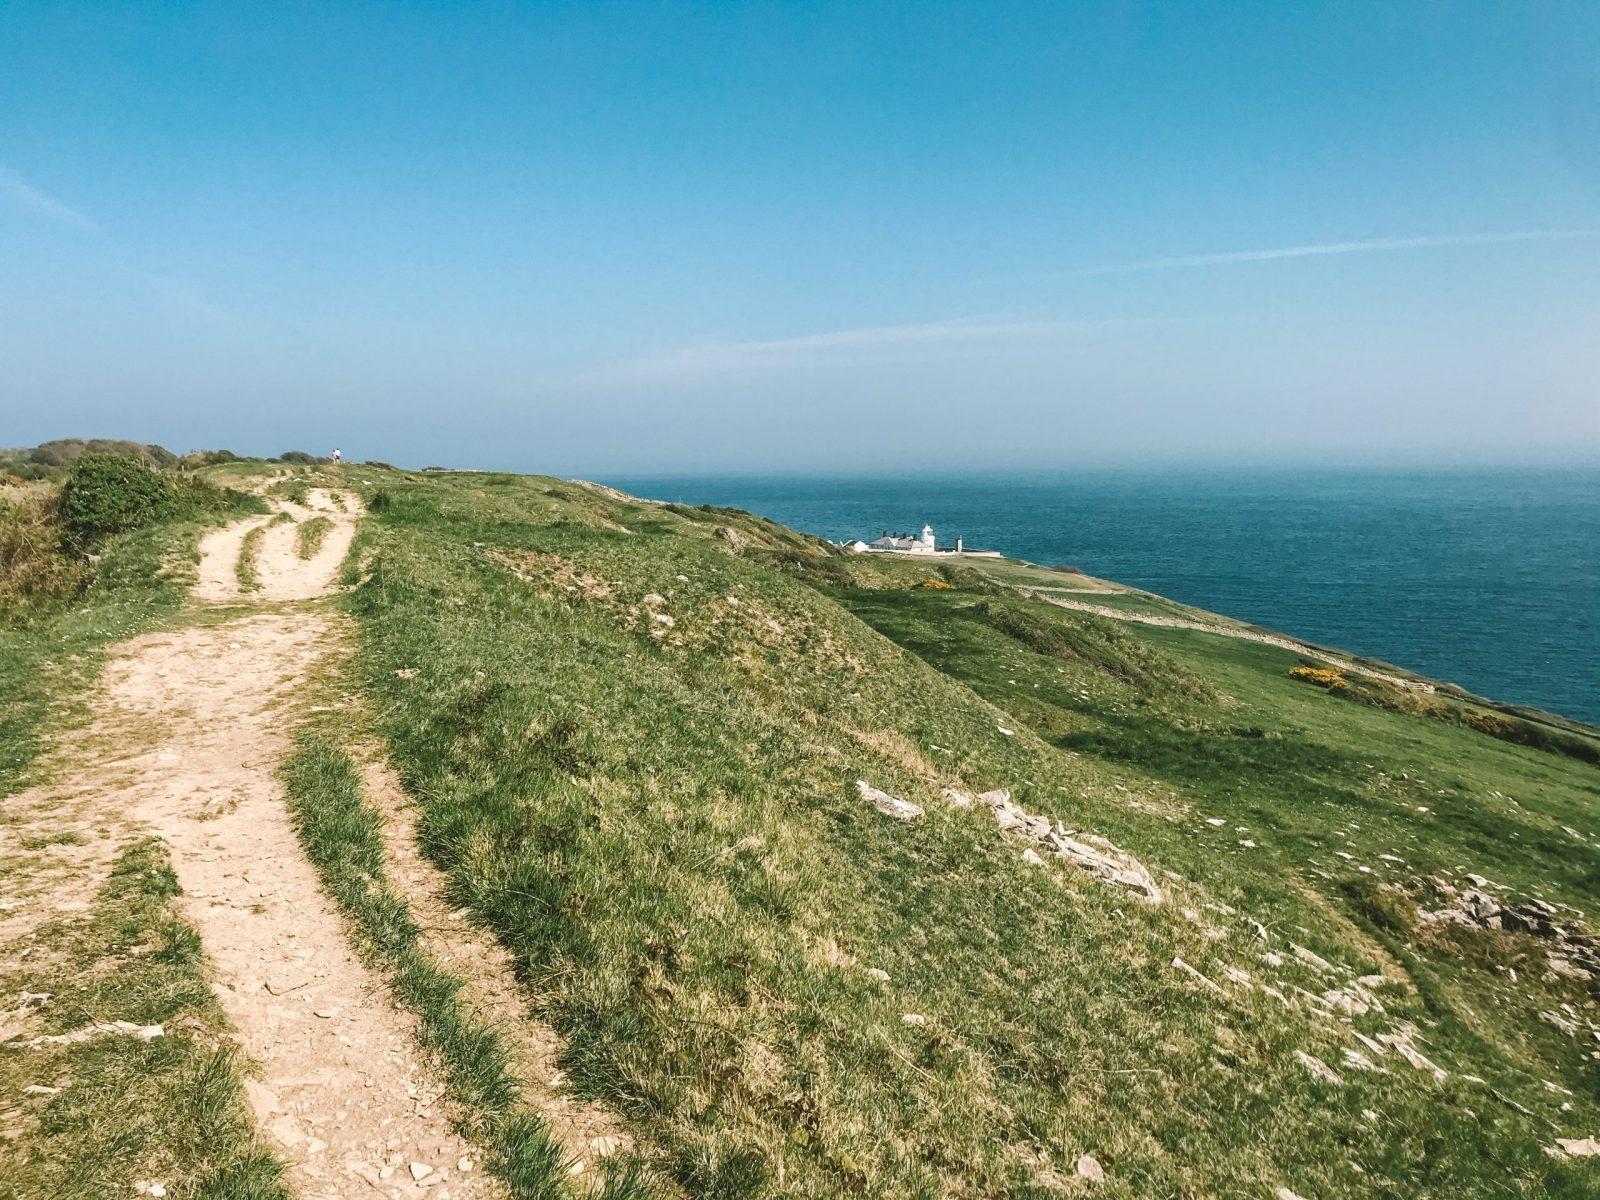 Jurassic Coast circular walks view